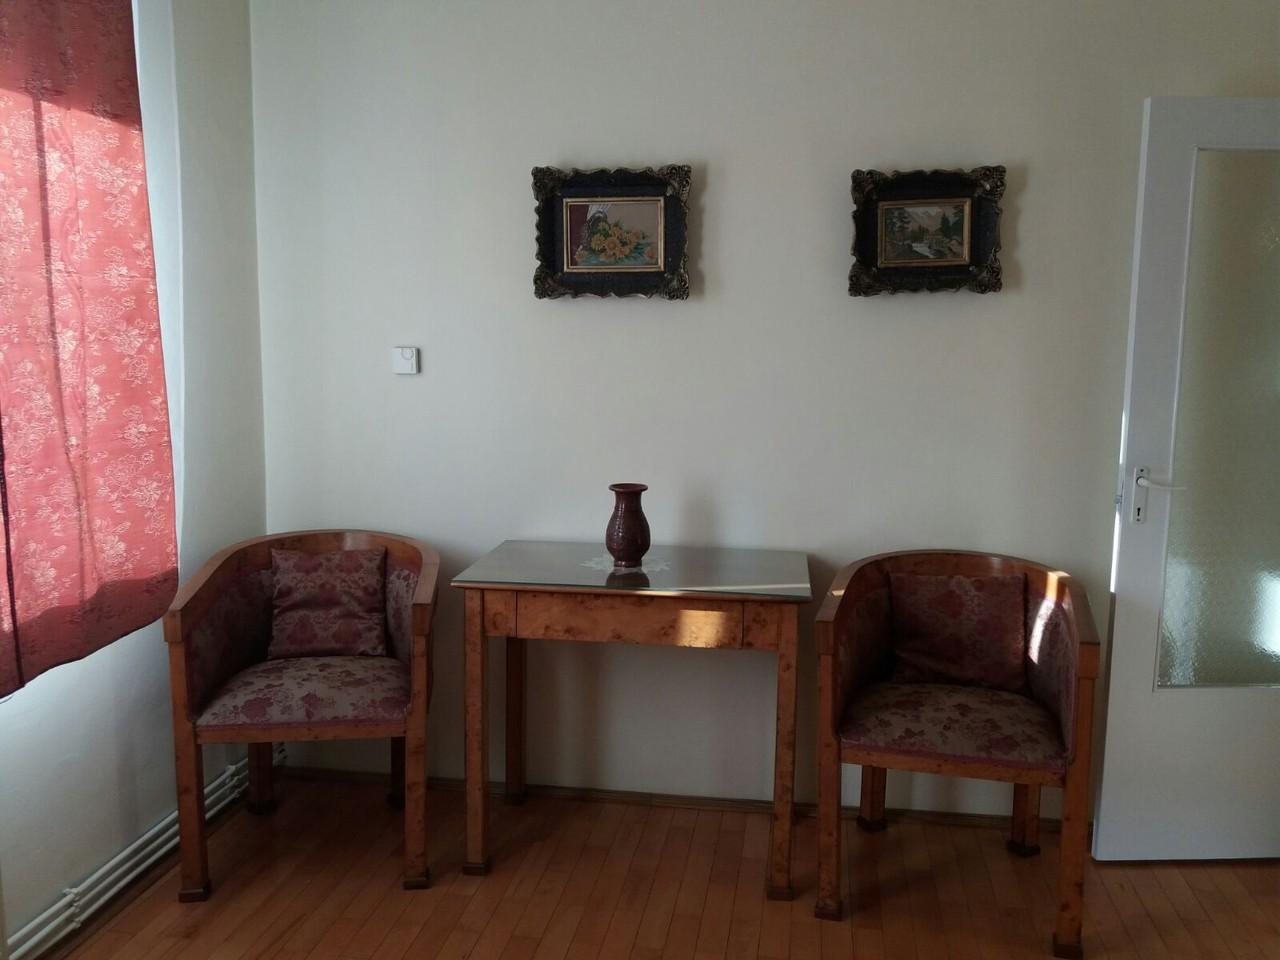 Apartament 2 camere de inchiriat in Sibiu zona Spitalului-10-2